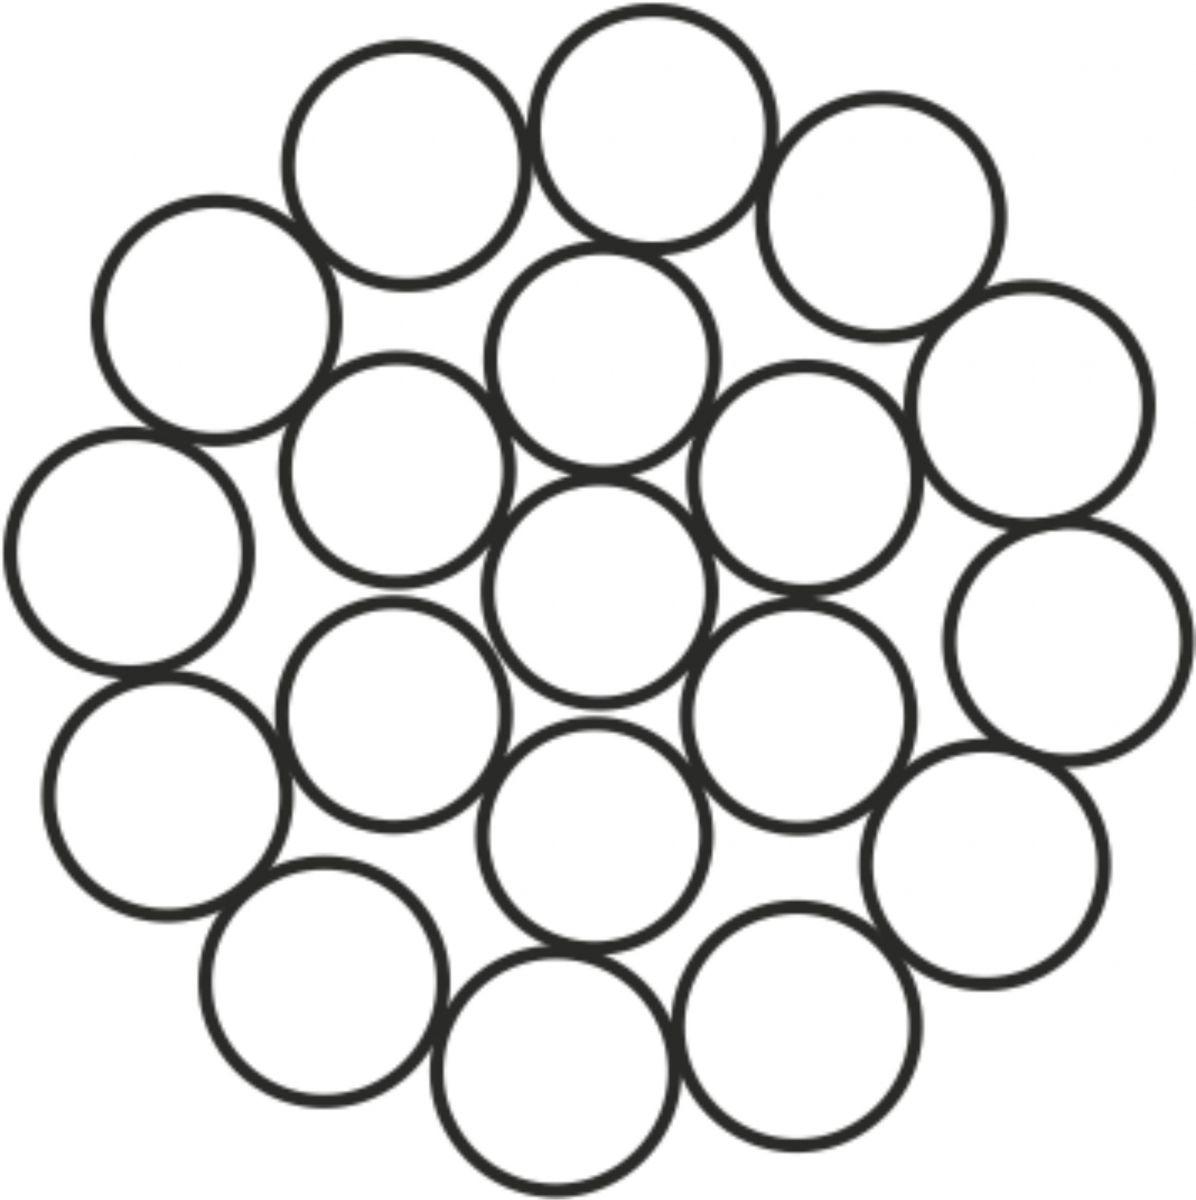 Çelik Halat 1x19 =1 (1 + 6 x 12)